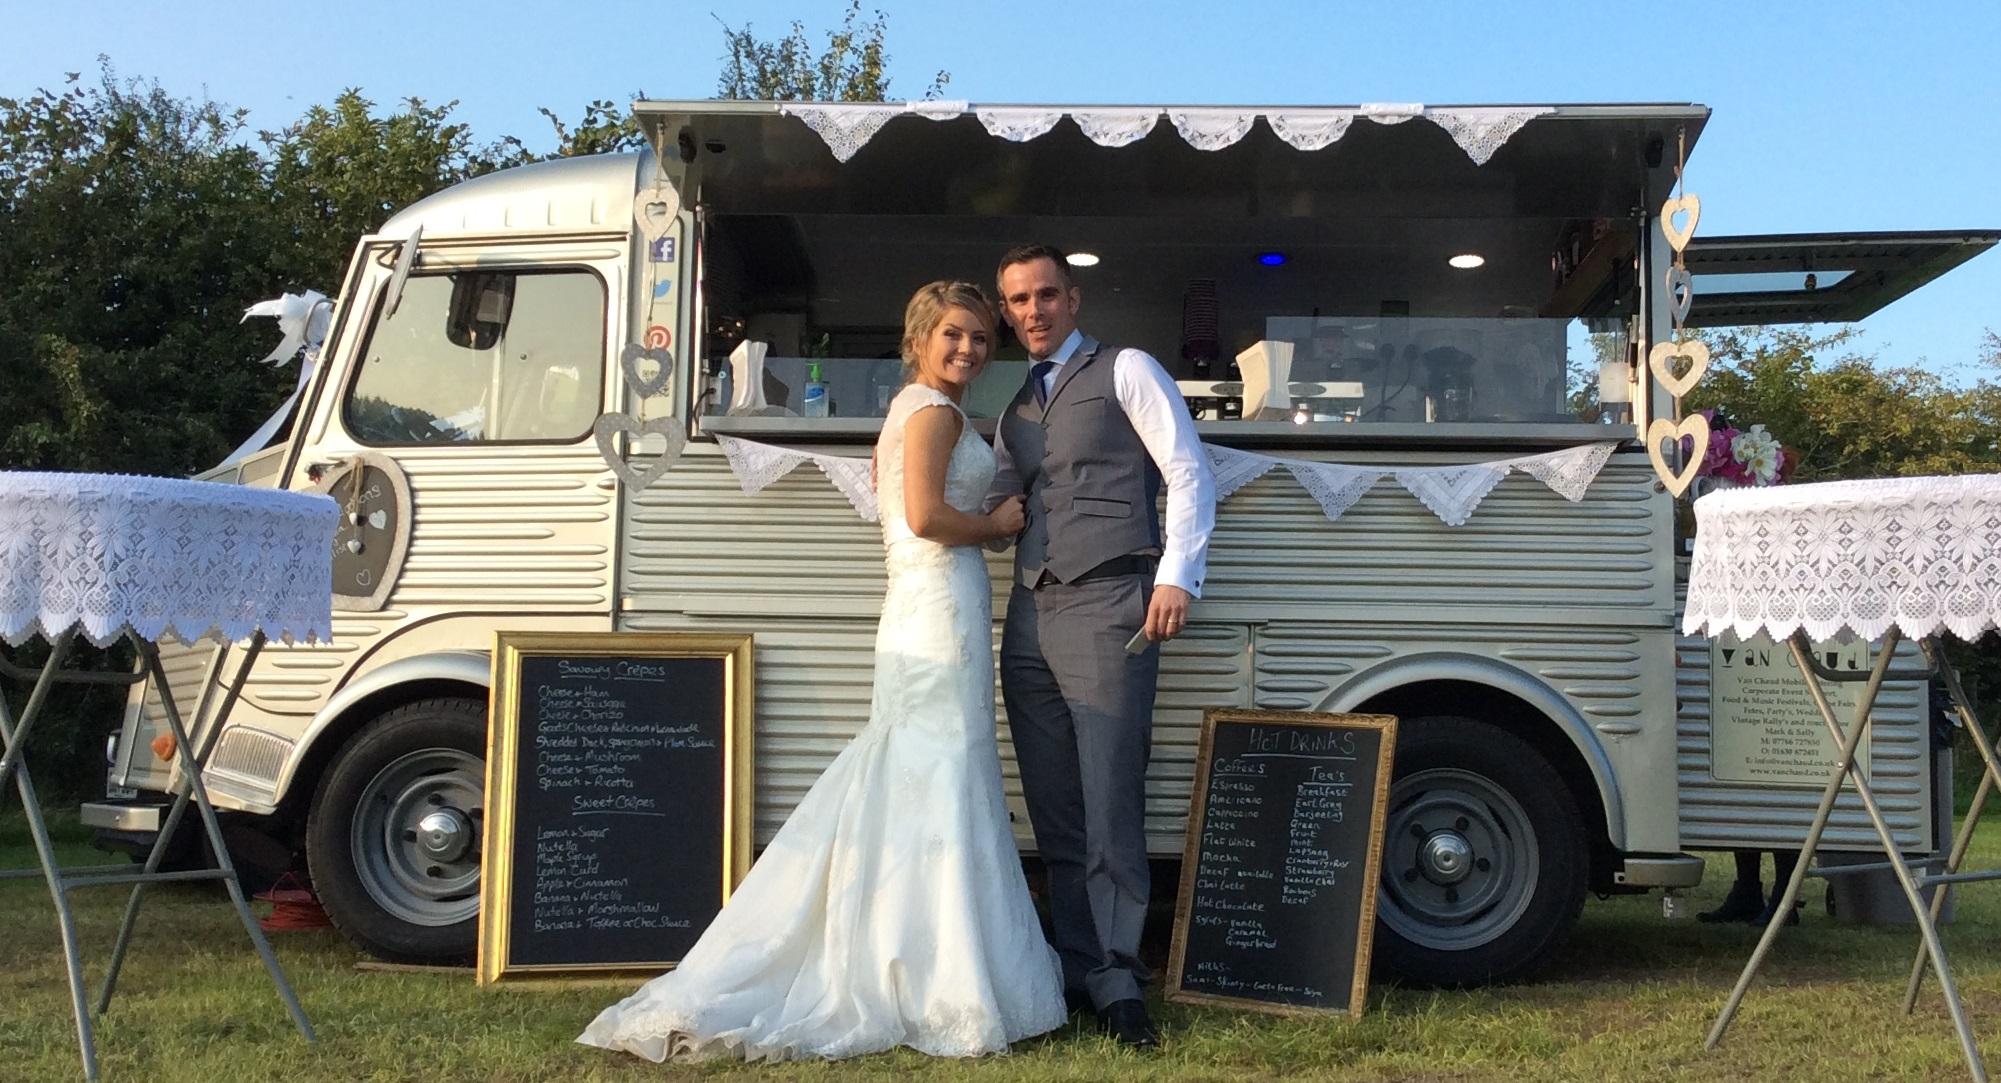 Hafod Farm Weddings in Snowdonia was the location for this wedding